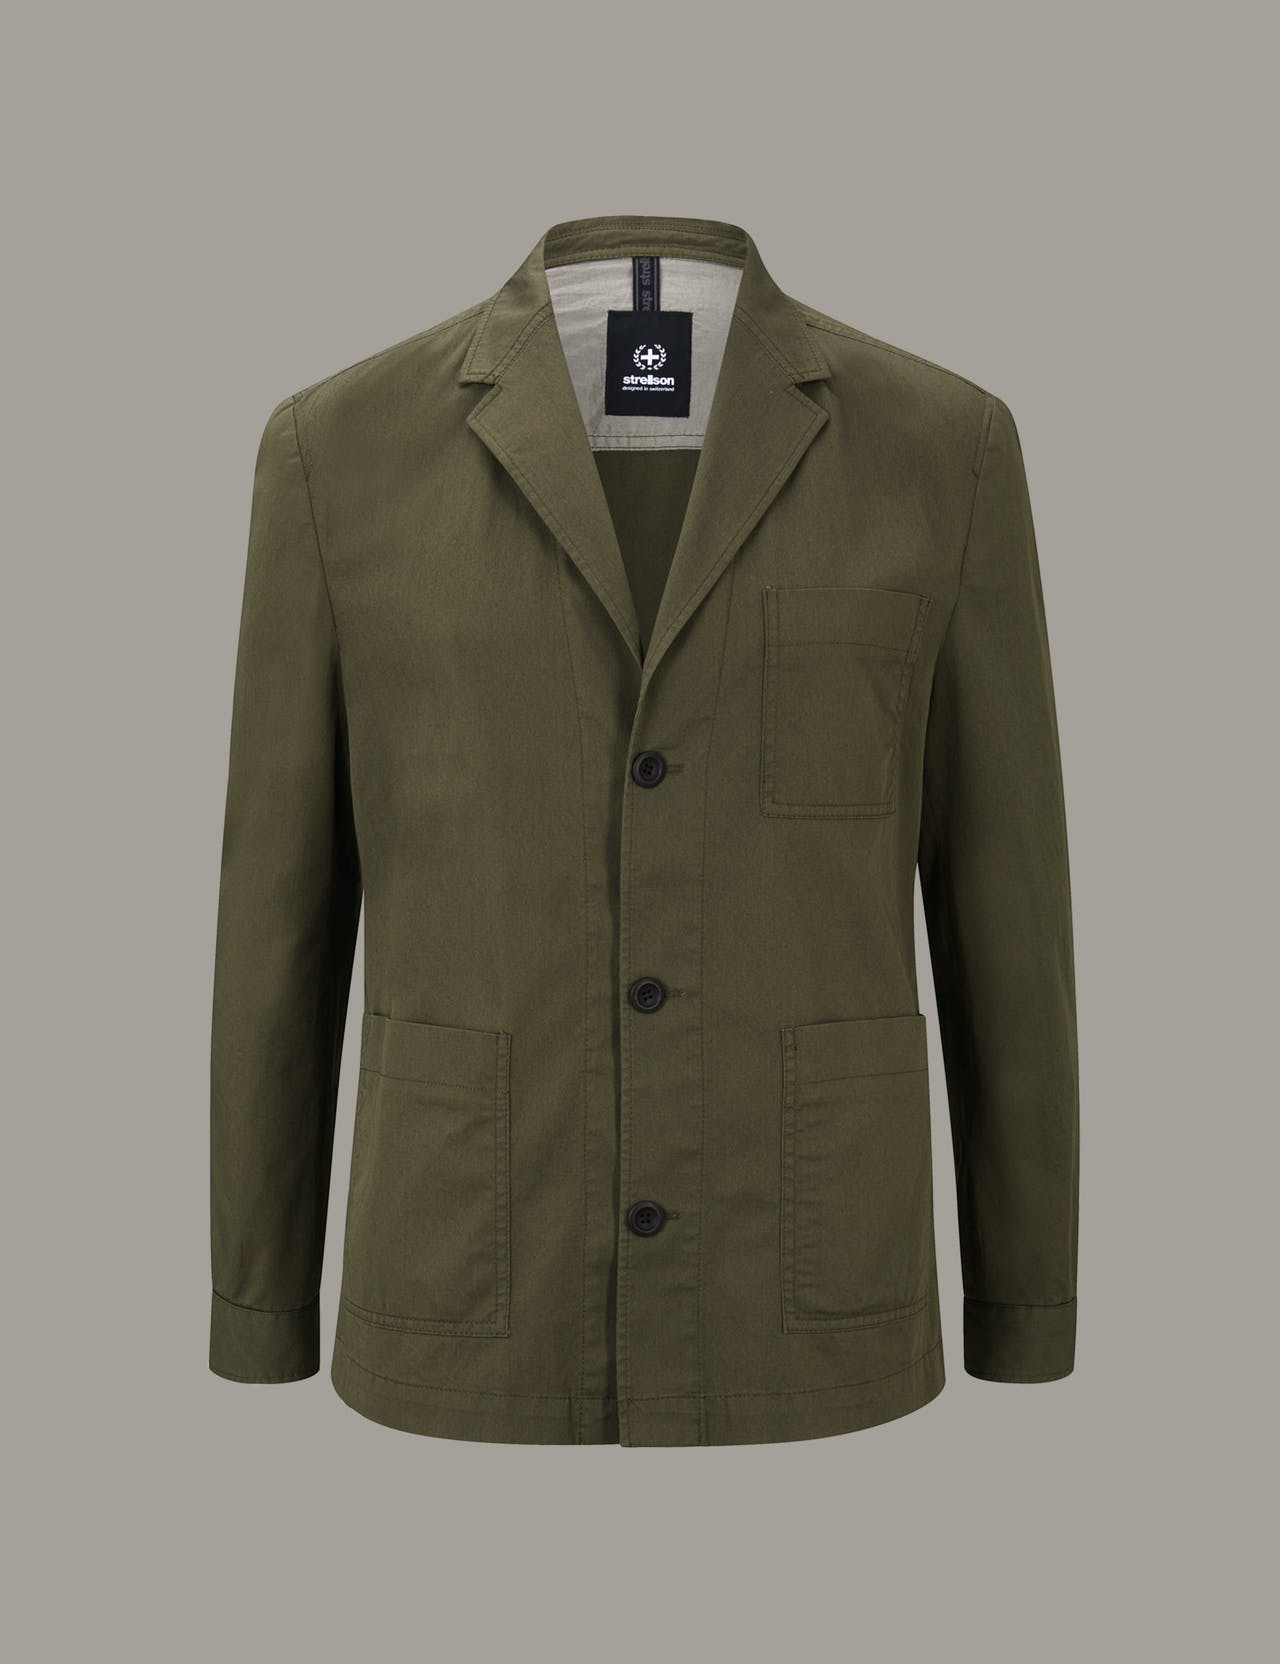 Veste chemise modulaire Davin, vert olive